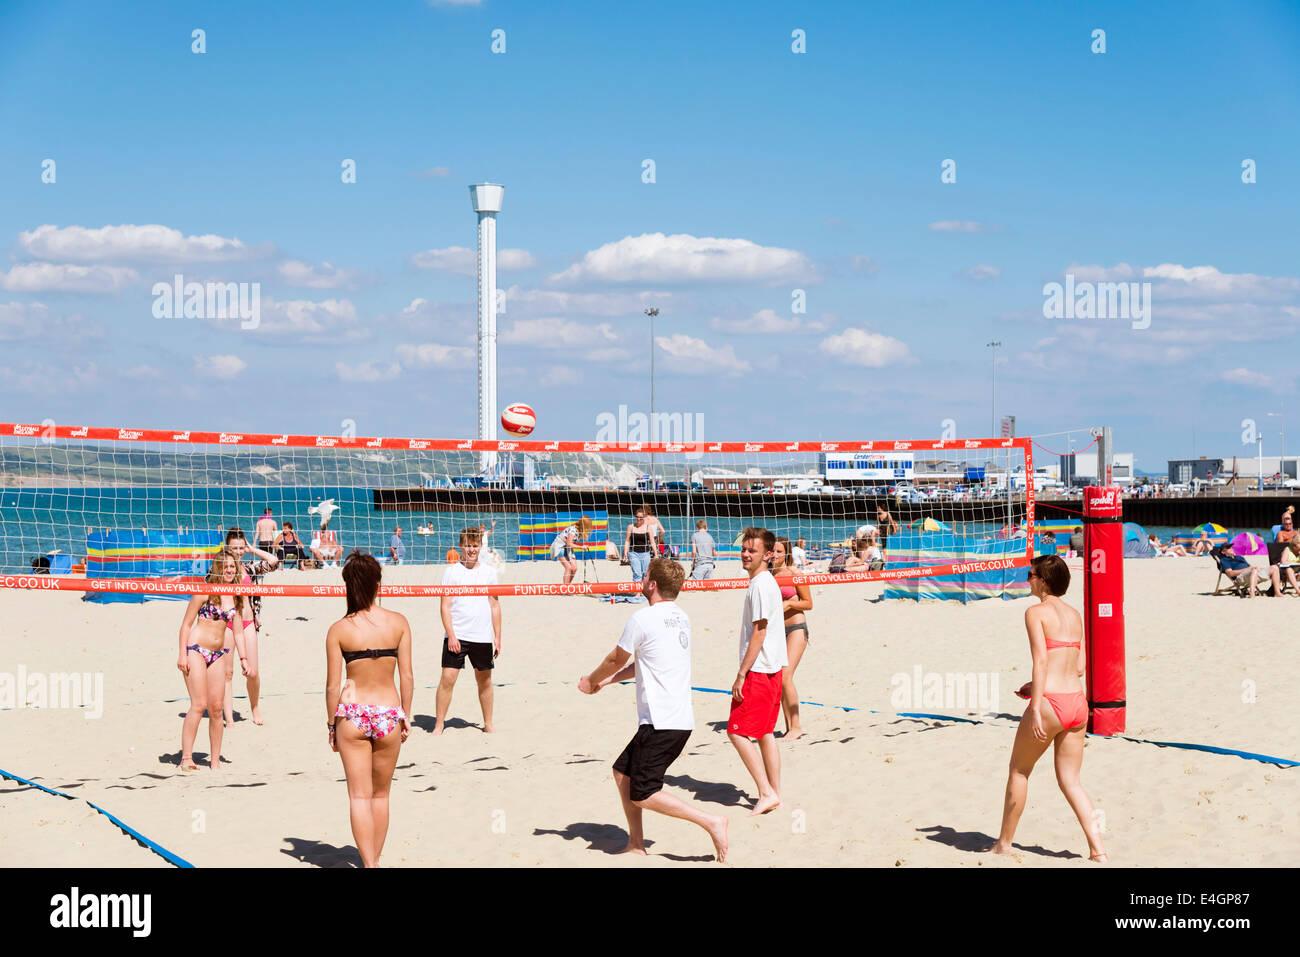 Menschen spielen Beach-Volleyball auf Weymouth, Dorset, UK. Stockbild